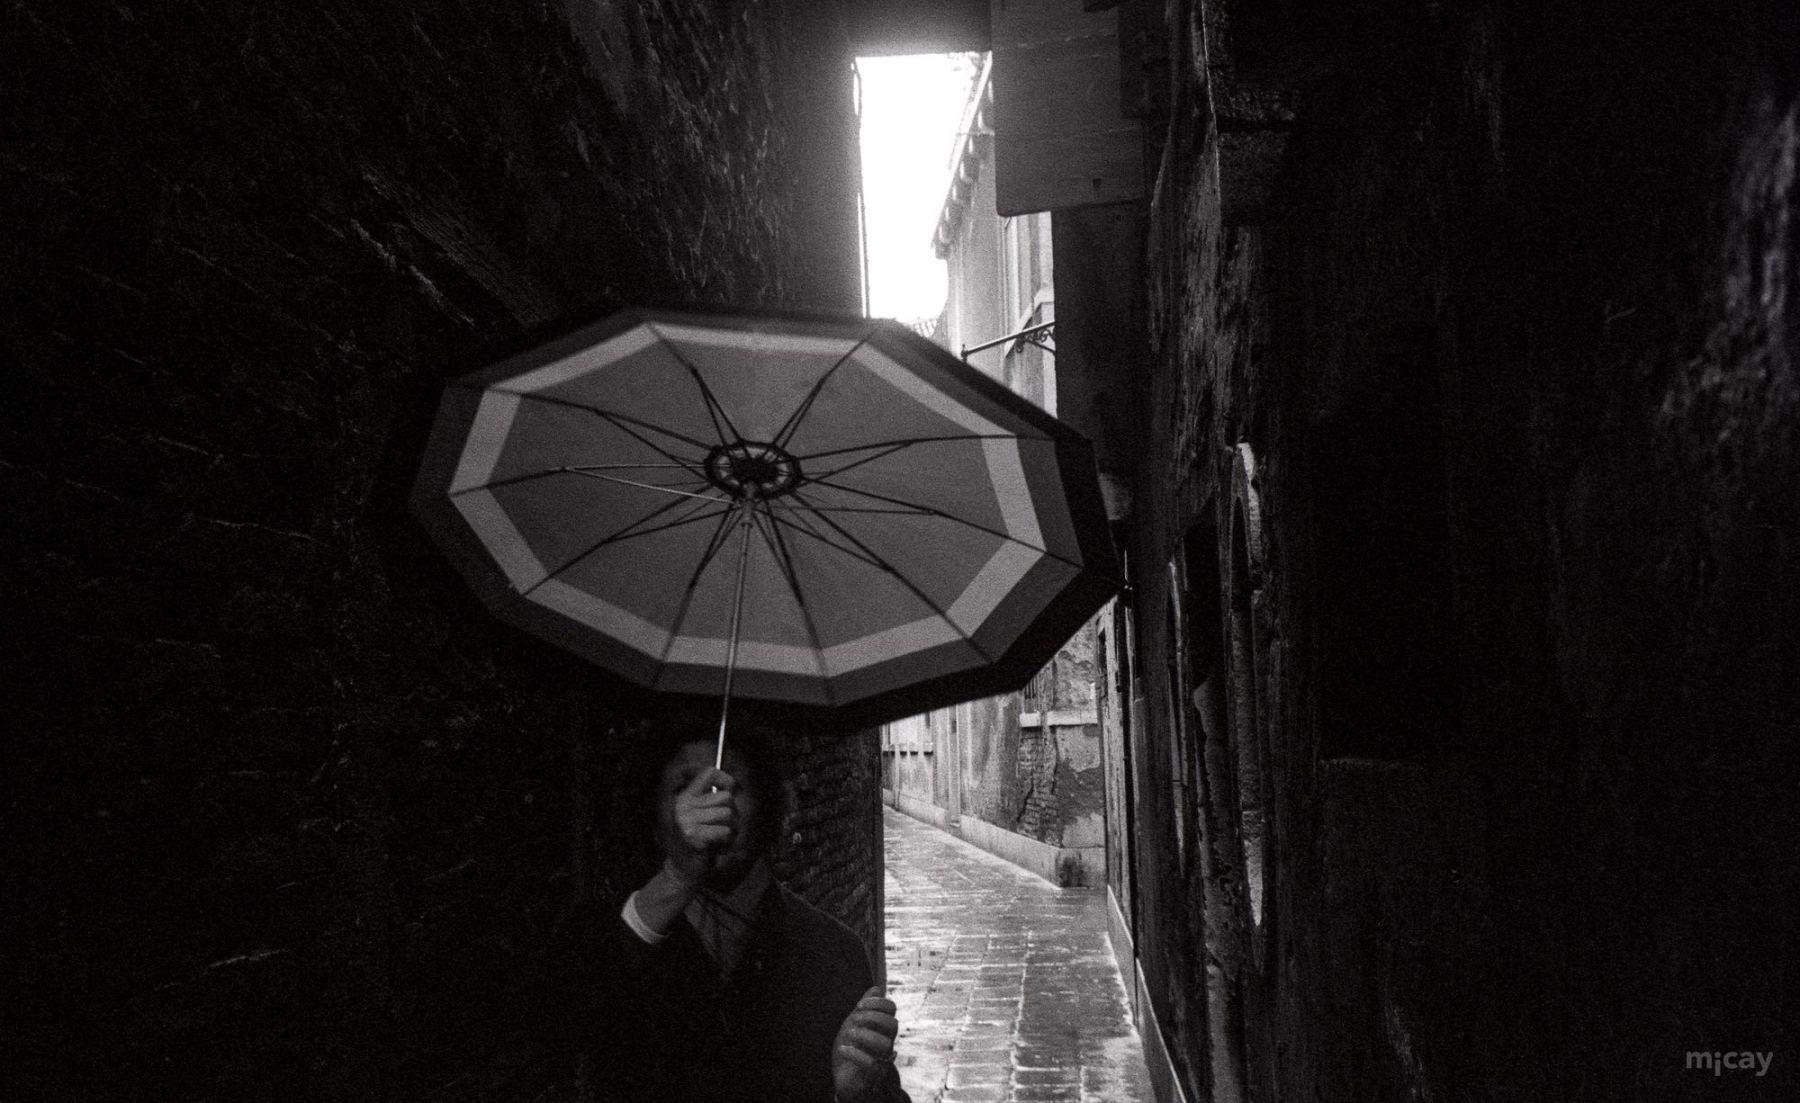 MichelAycaguer-Venise-AquaAlta-Noel-1981-33